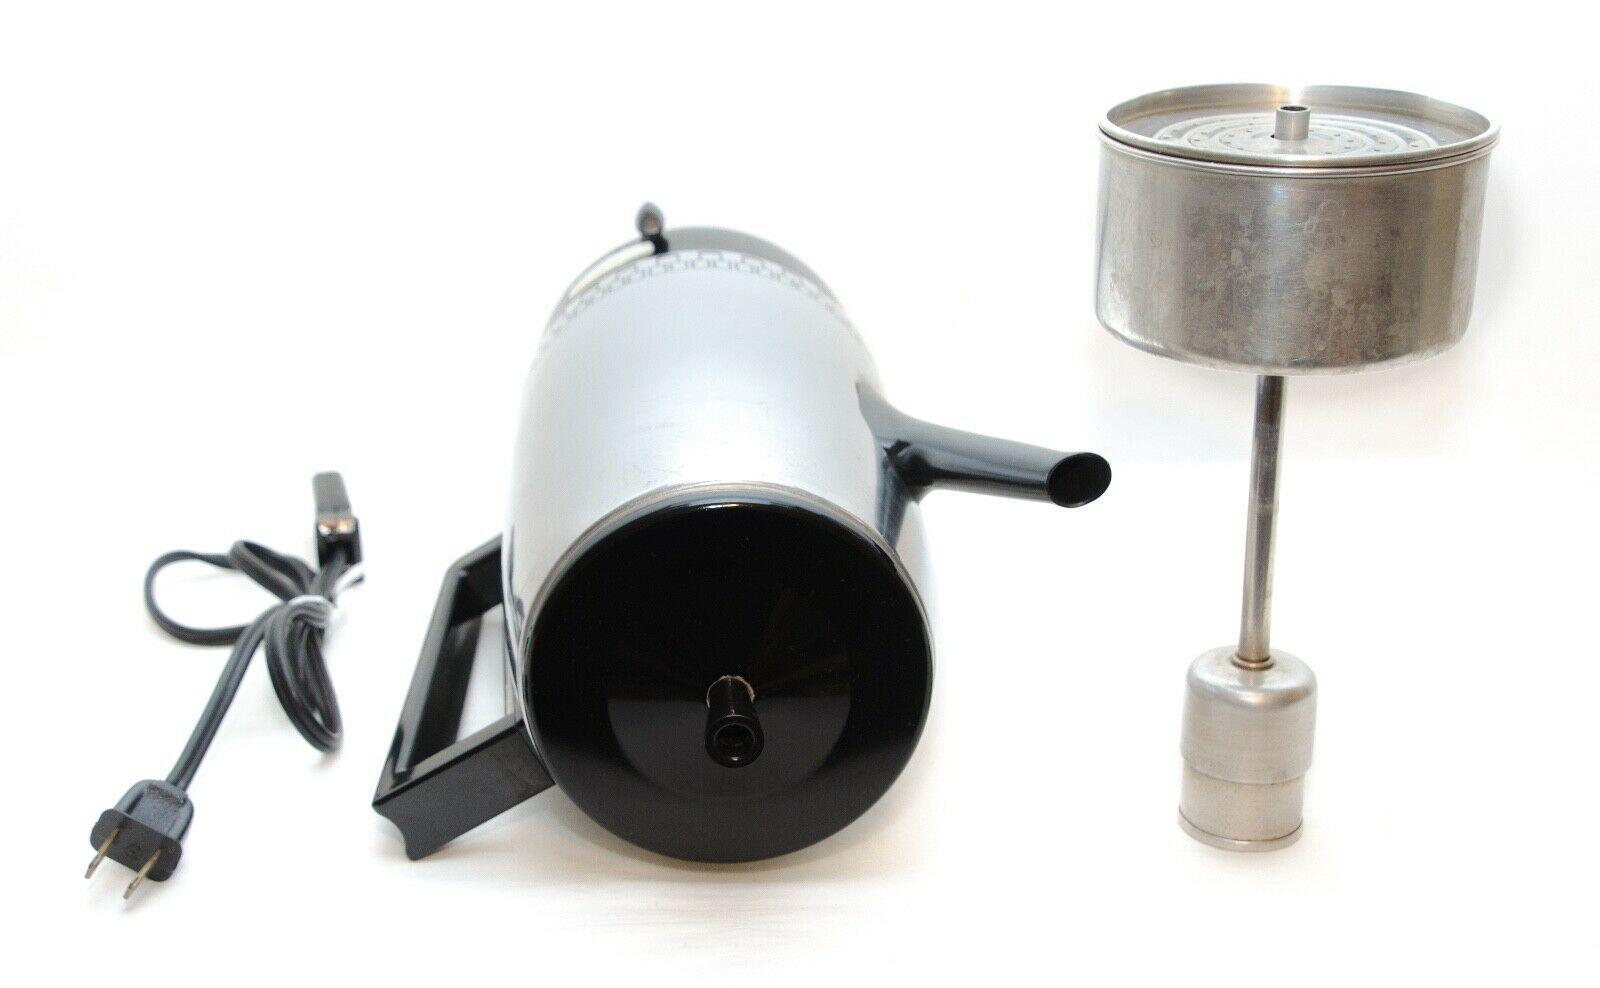 Vintage Empire Aluminum Automatic 12-Cup Percolator Coffee Pot Maker